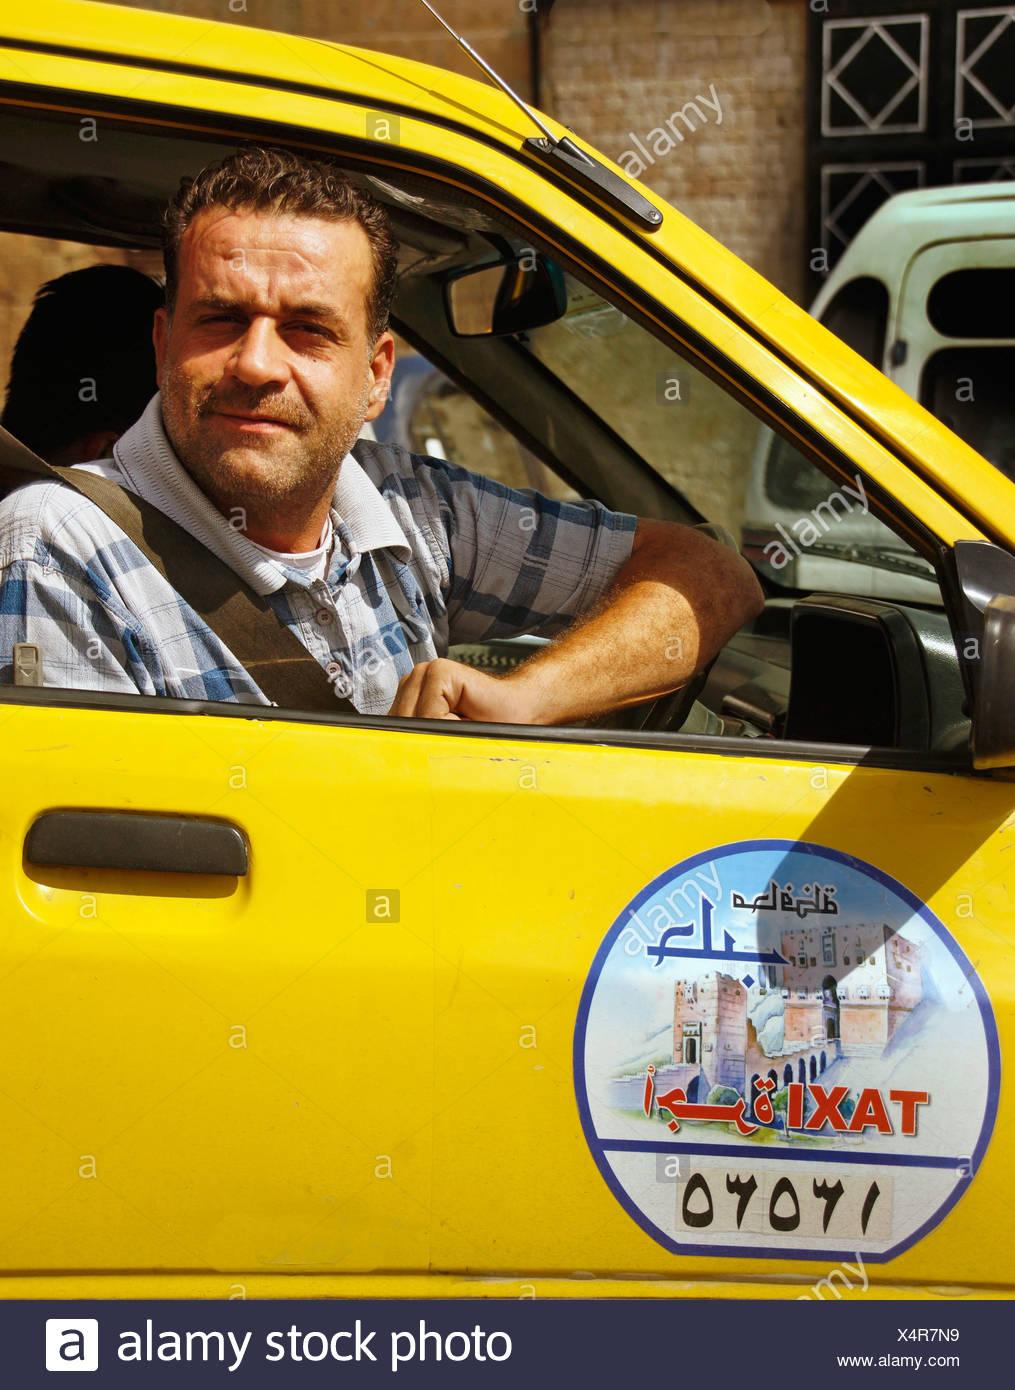 Taxi, Aleppo, Syria - Stock Image